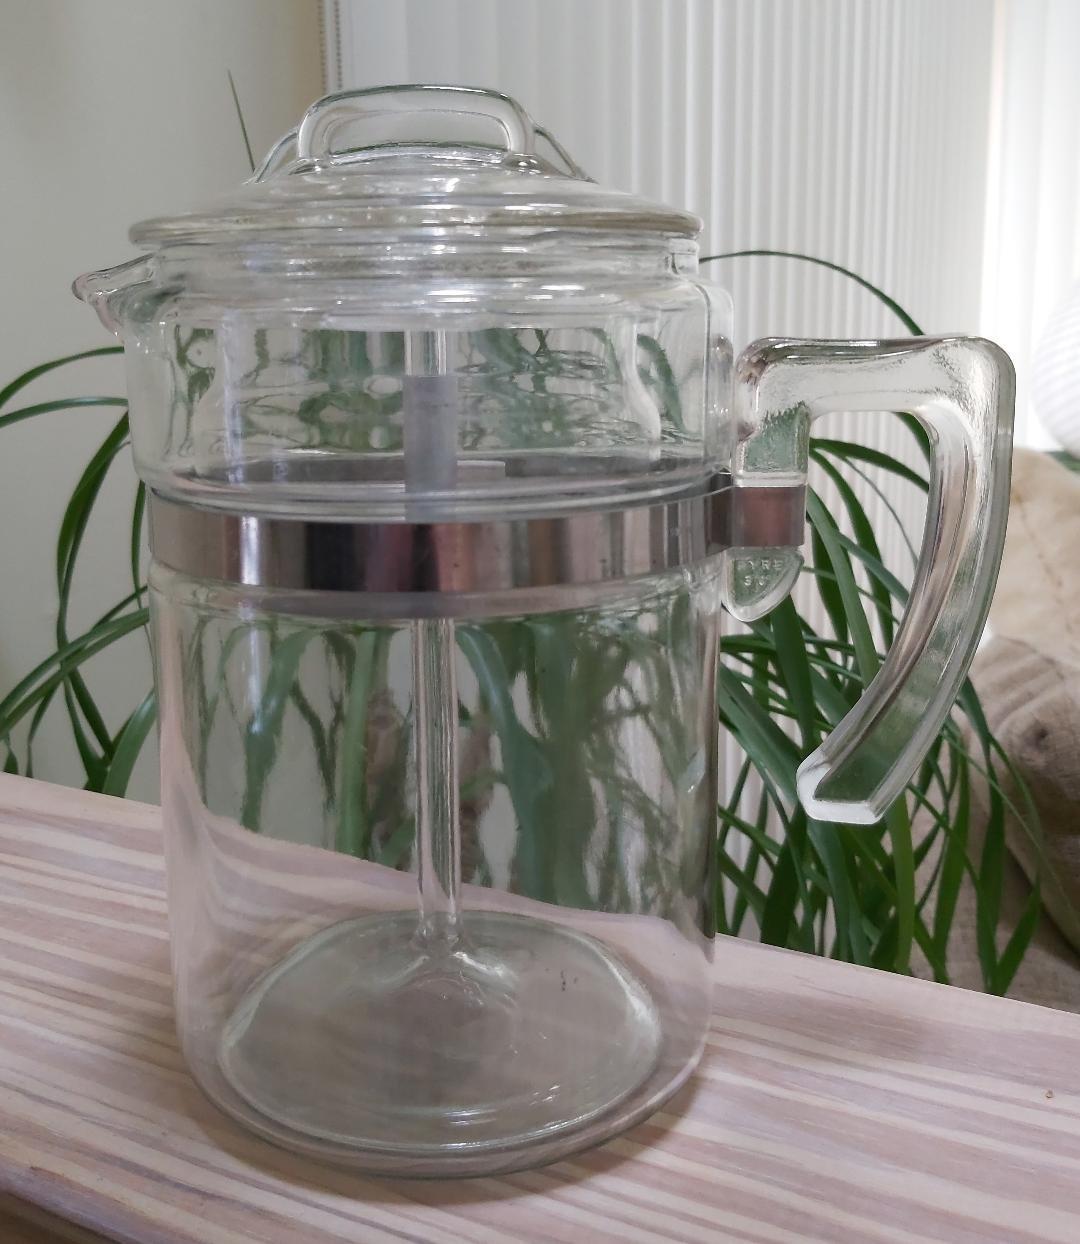 Vintage Pyrex 6 Cup Stove Top Flameware Percolator Coffee Pot Model 7826-B - COMPLETE - SUPER CLEAN!